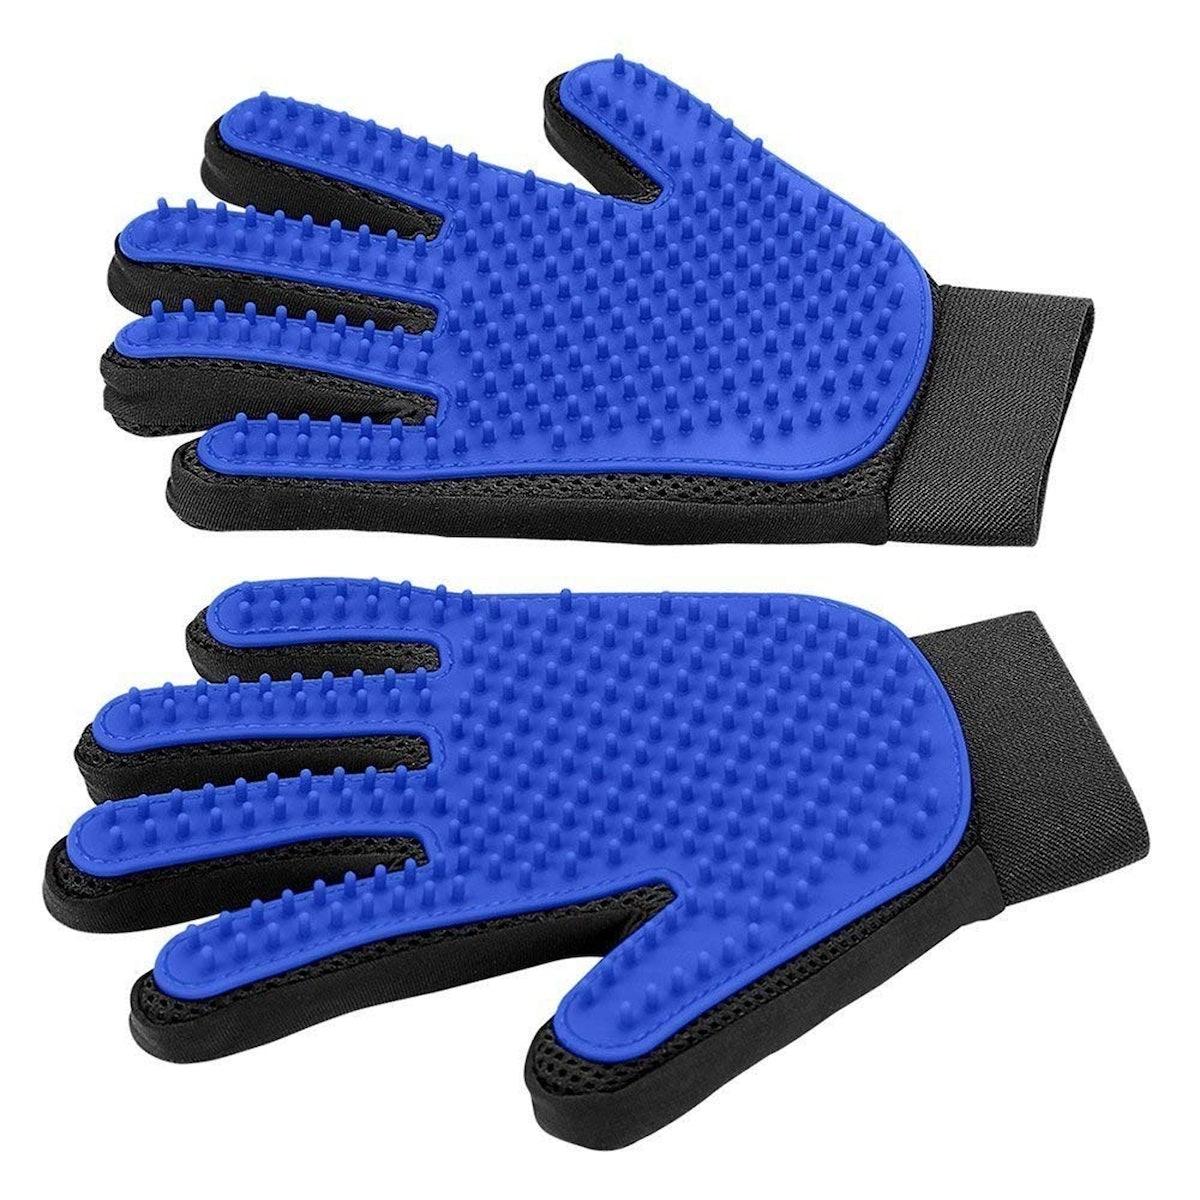 Delomo Pet Grooming Glove